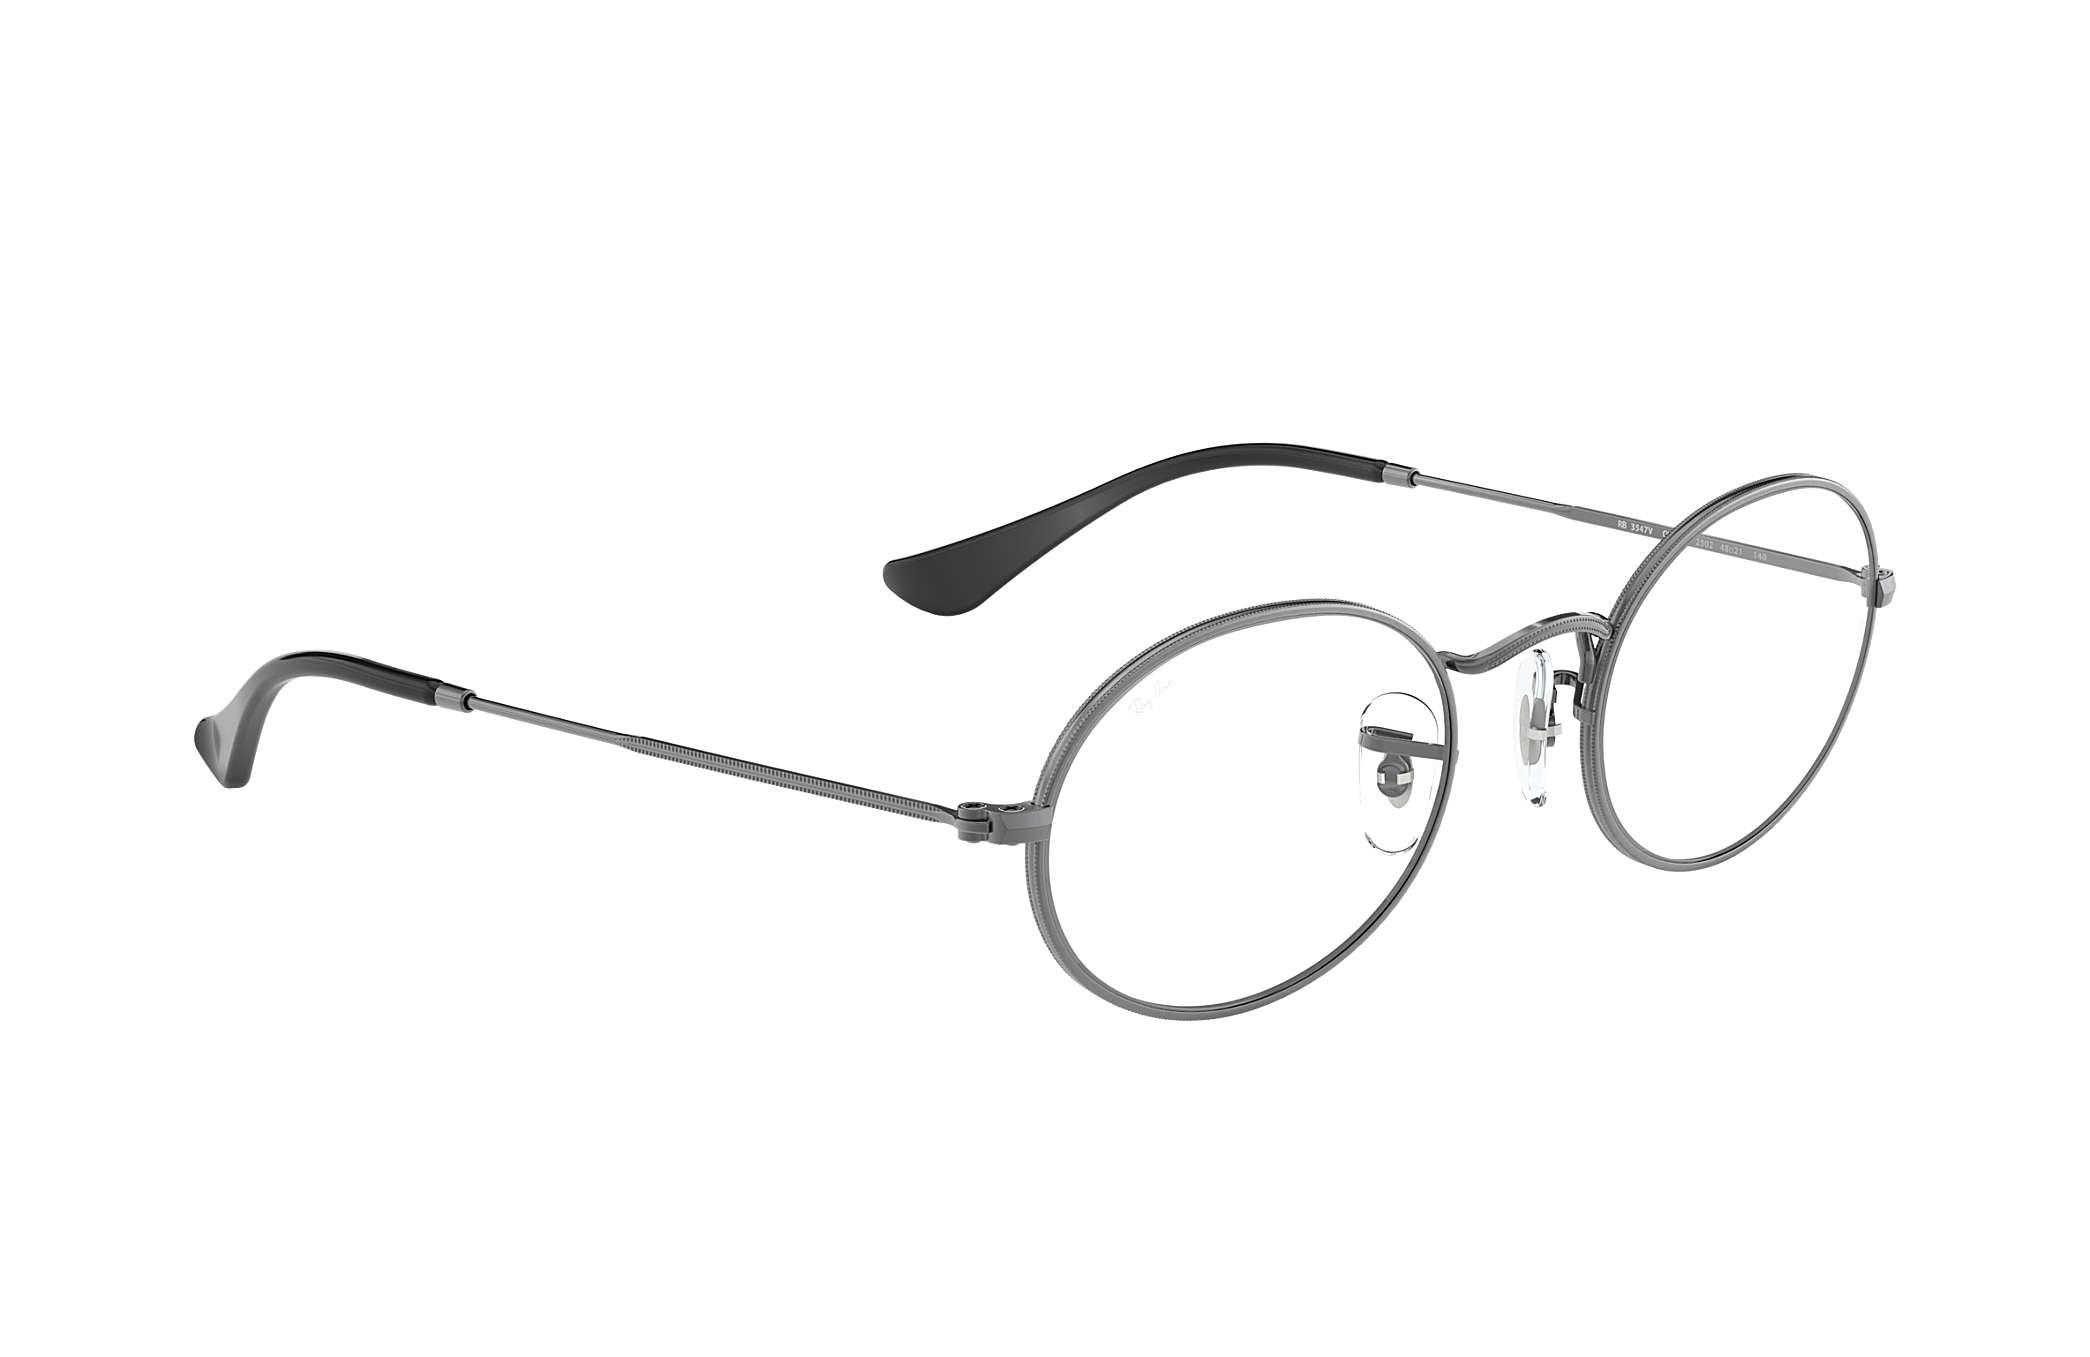 Ray-Ban prescription glasses Oval Optics RB3547V Gunmetal - Metal ...